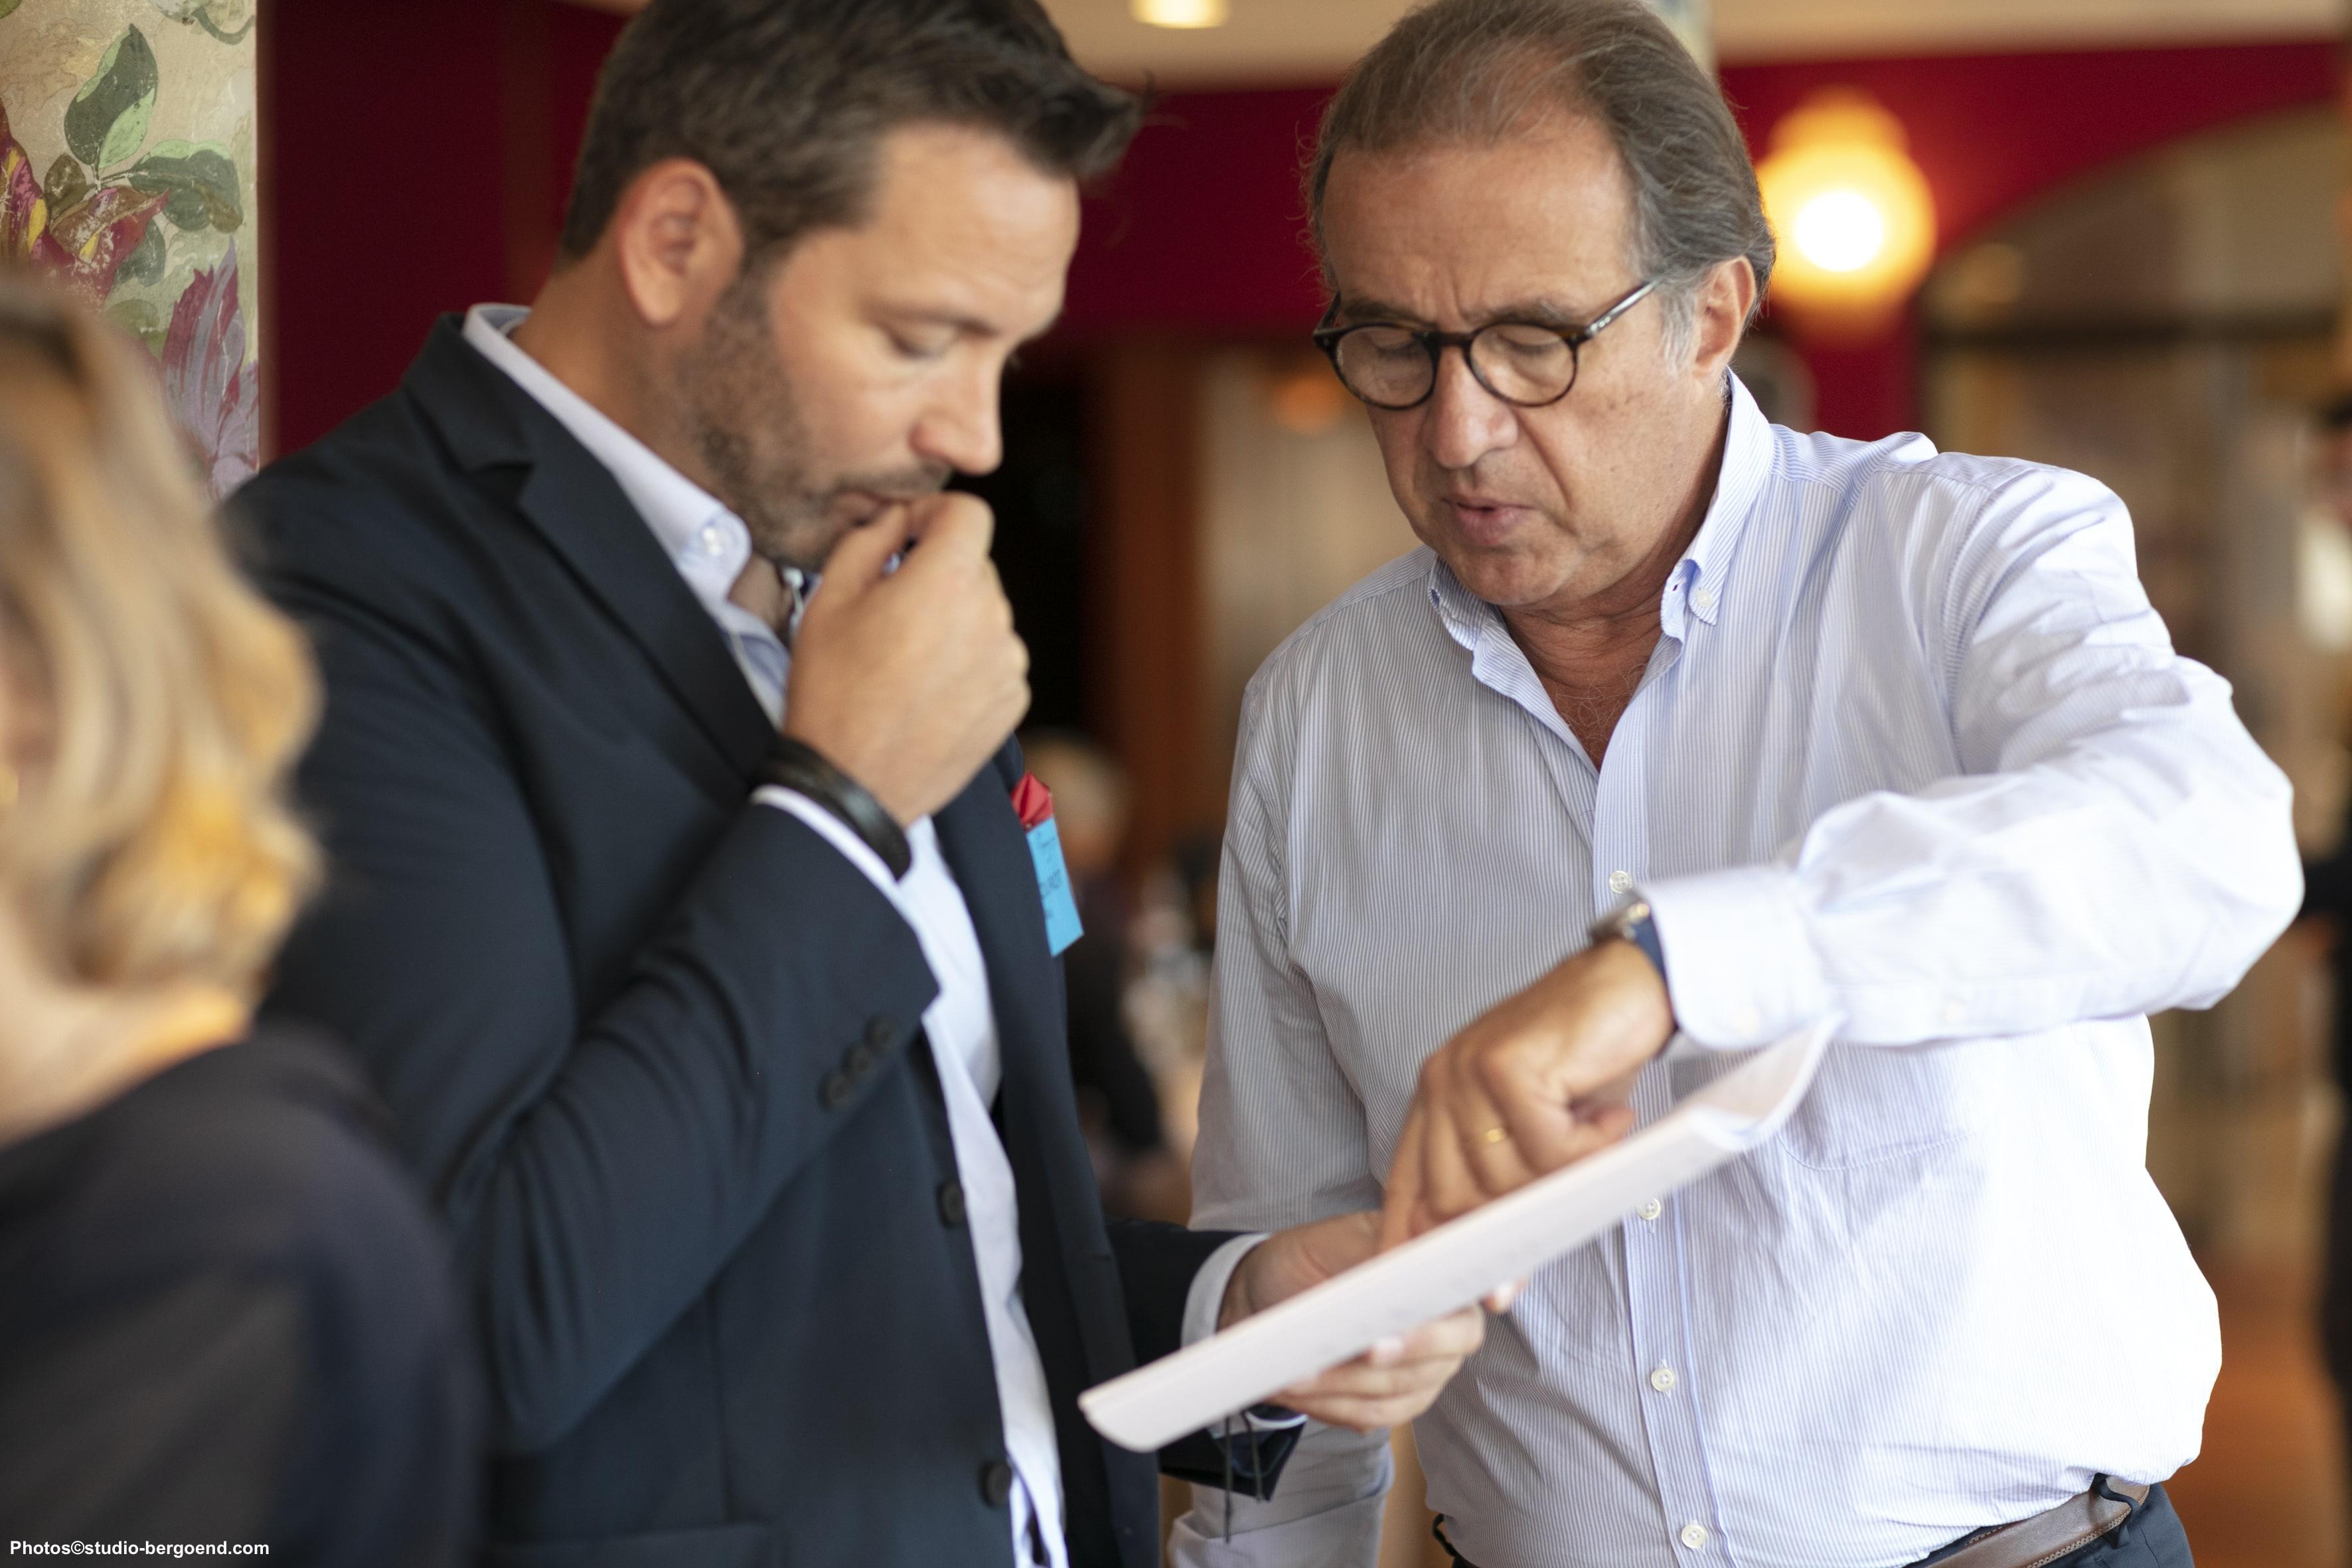 Arnaud Mourot and Jean-François de Lavison